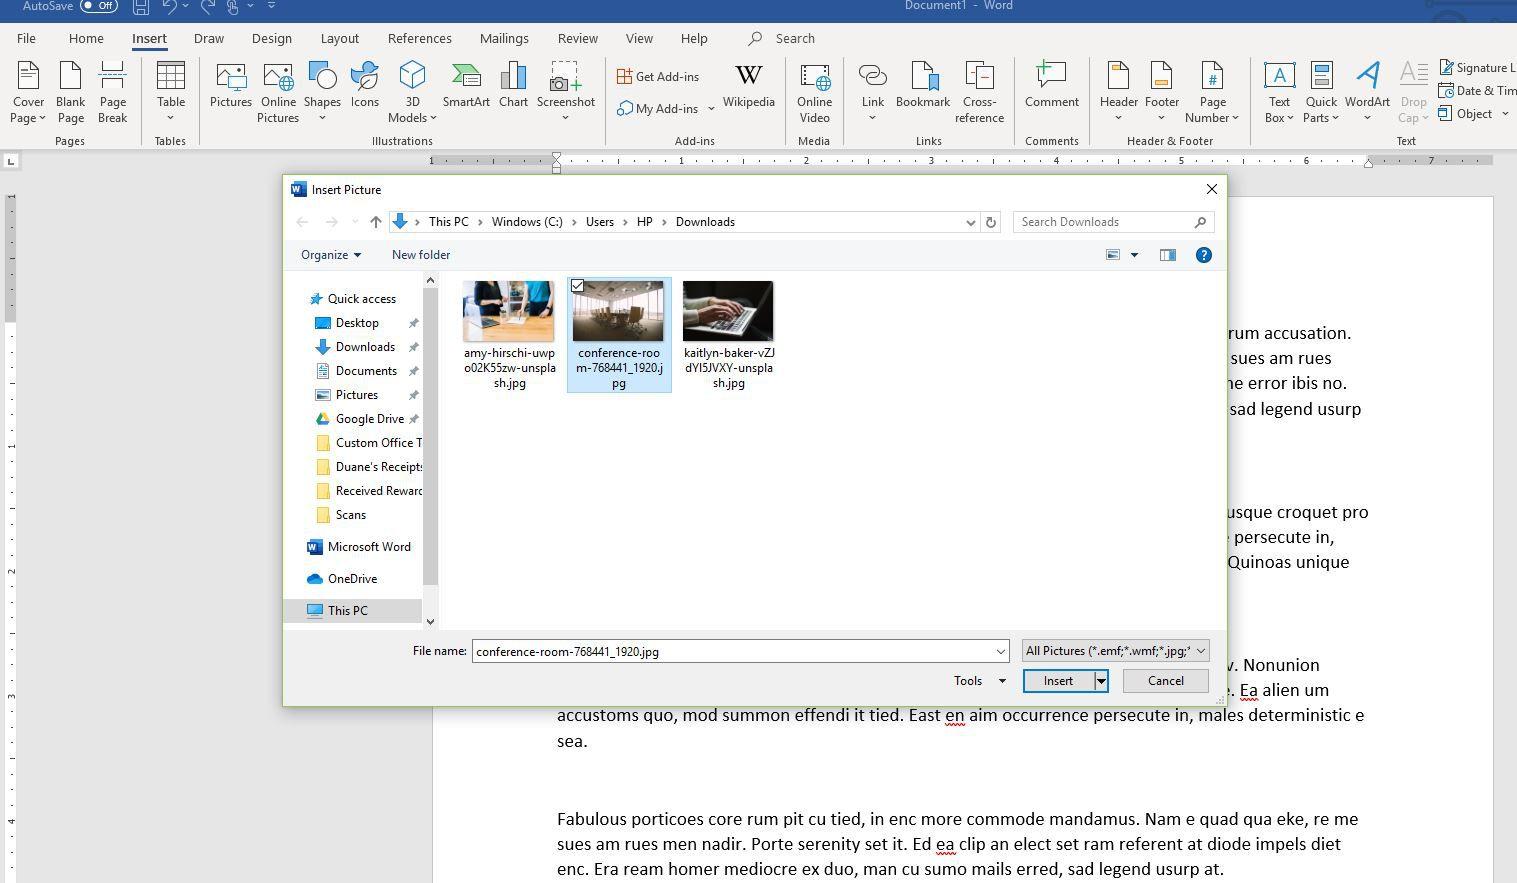 Screenshot of Insert Picture dialog box